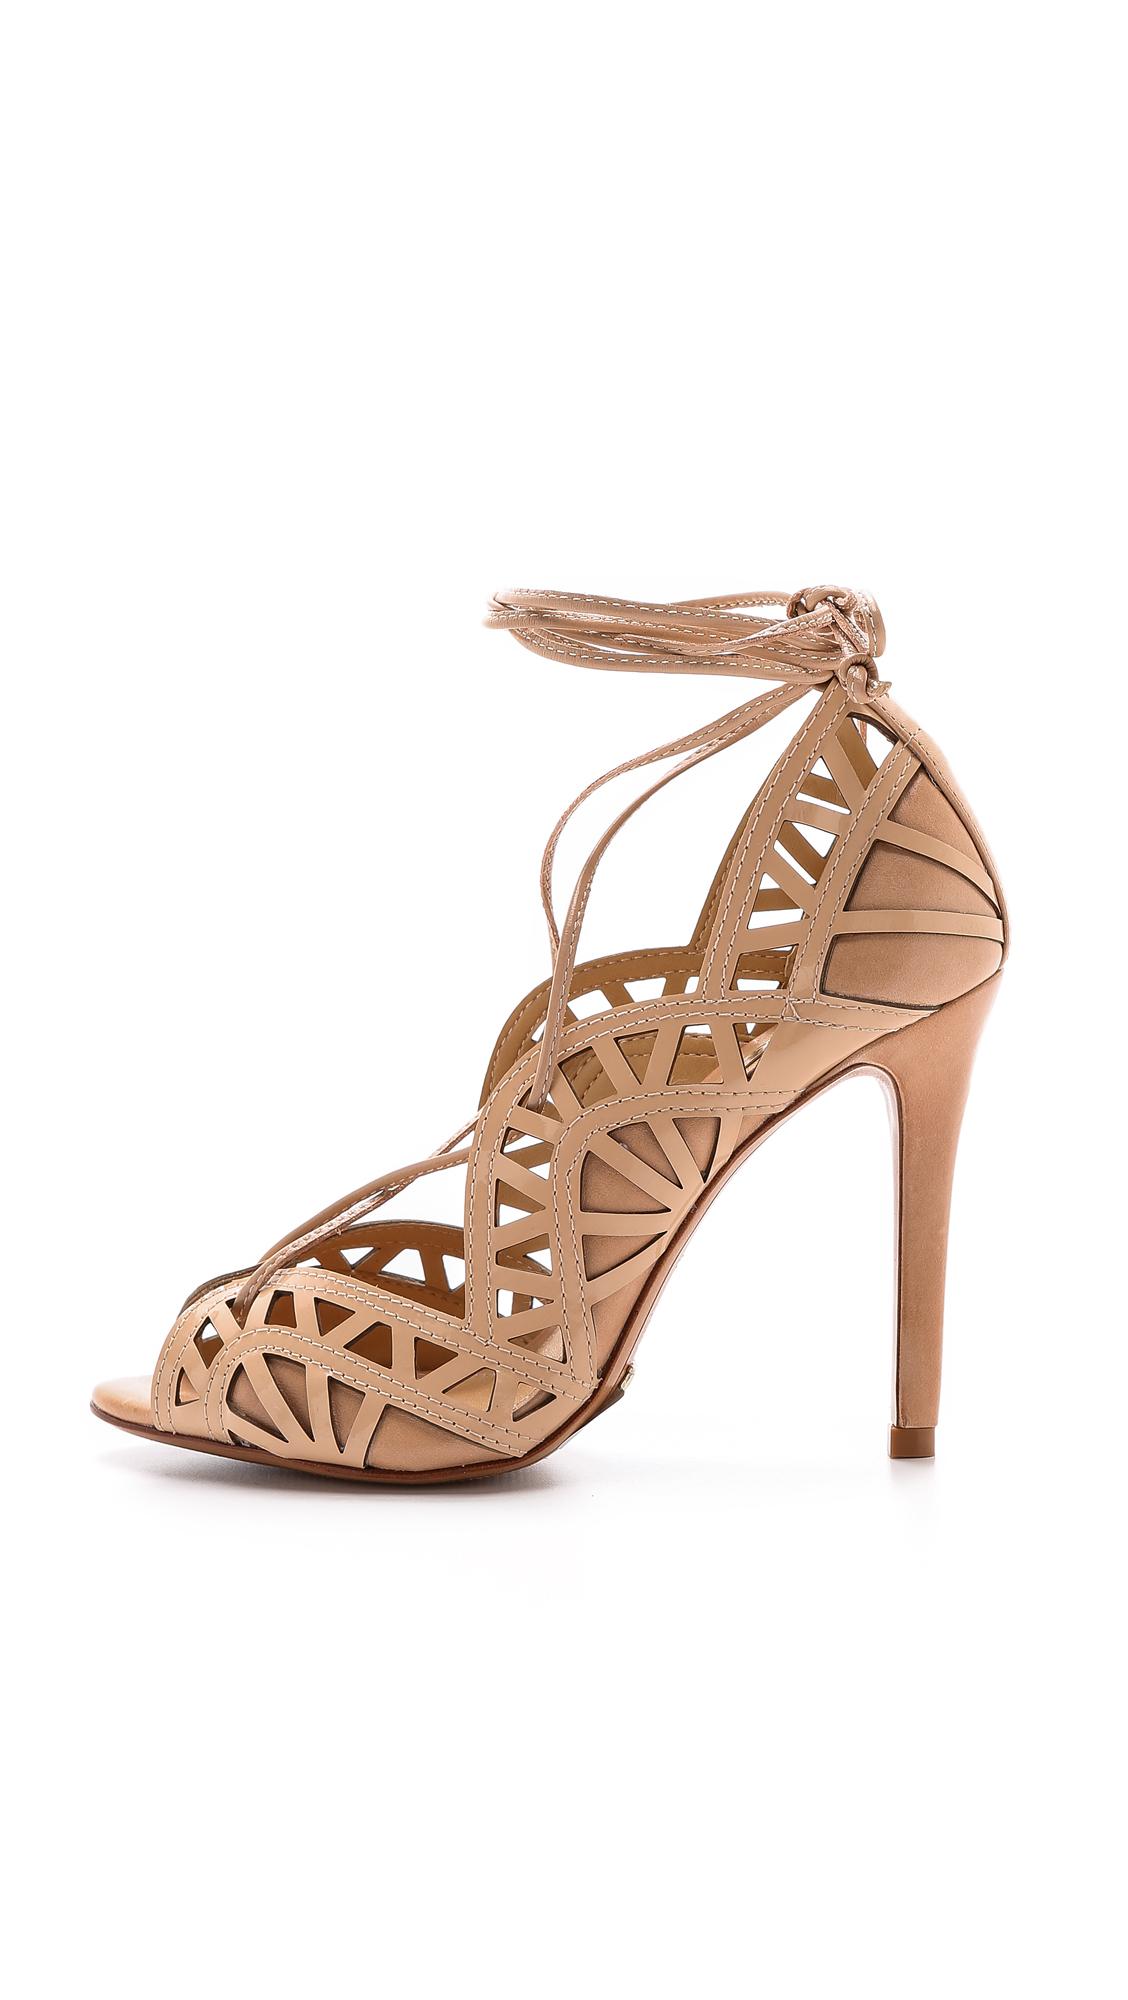 c07c5600452f Schutz Dubianna Lace Up Sandals